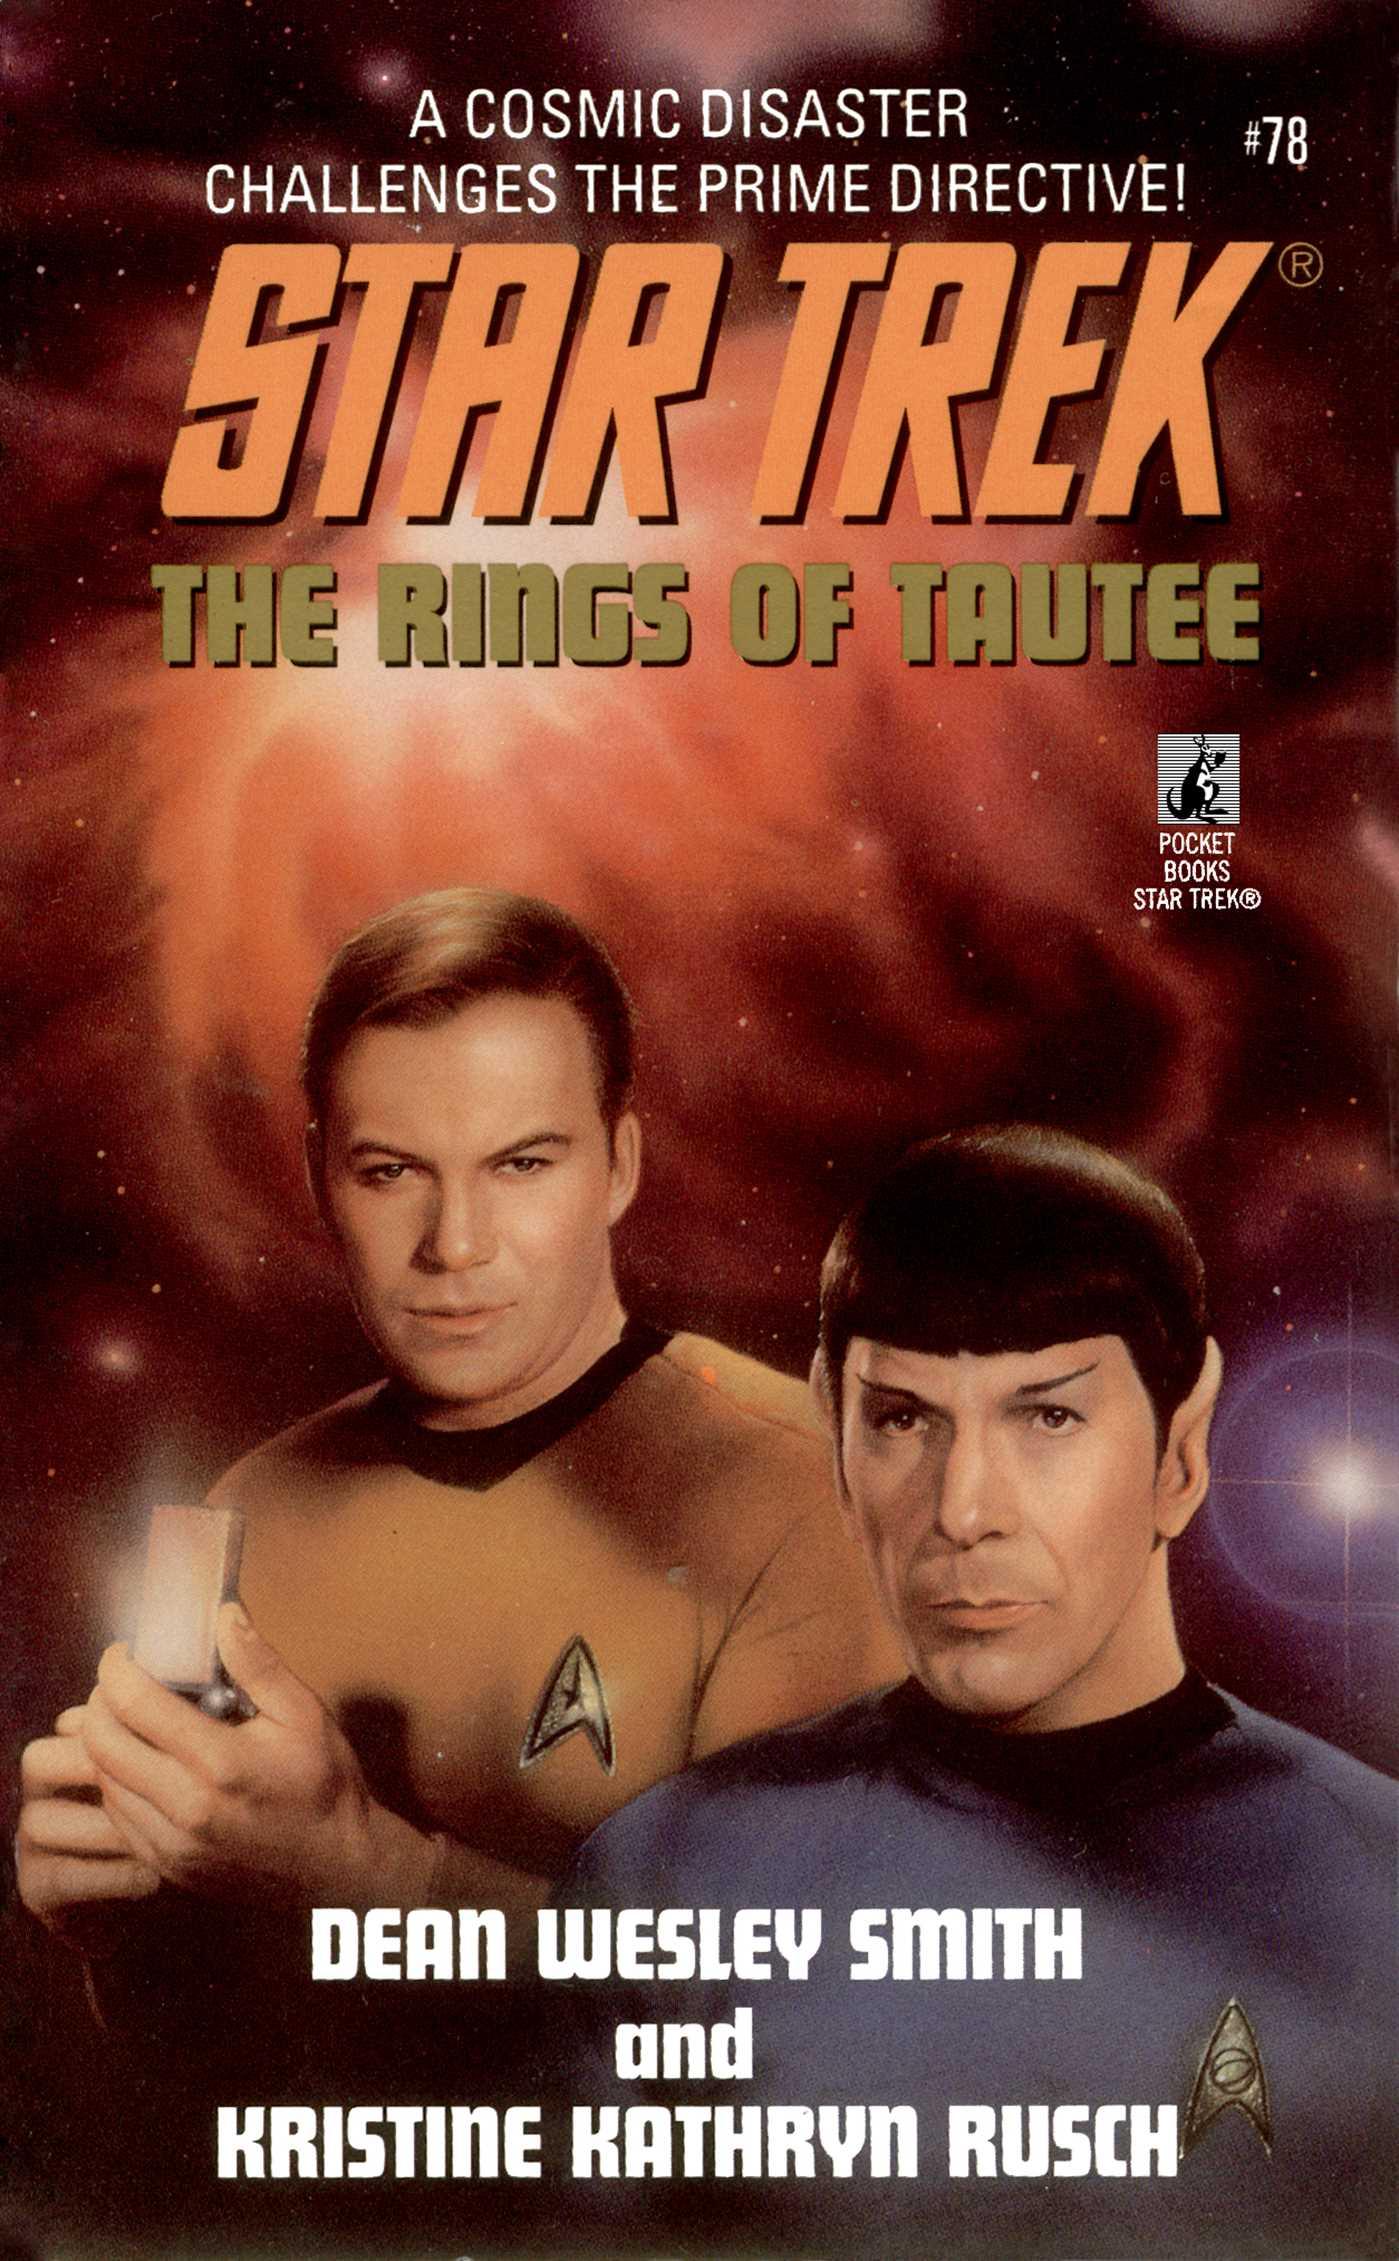 The star trek the original series the rings of taute 9780743420297 hr